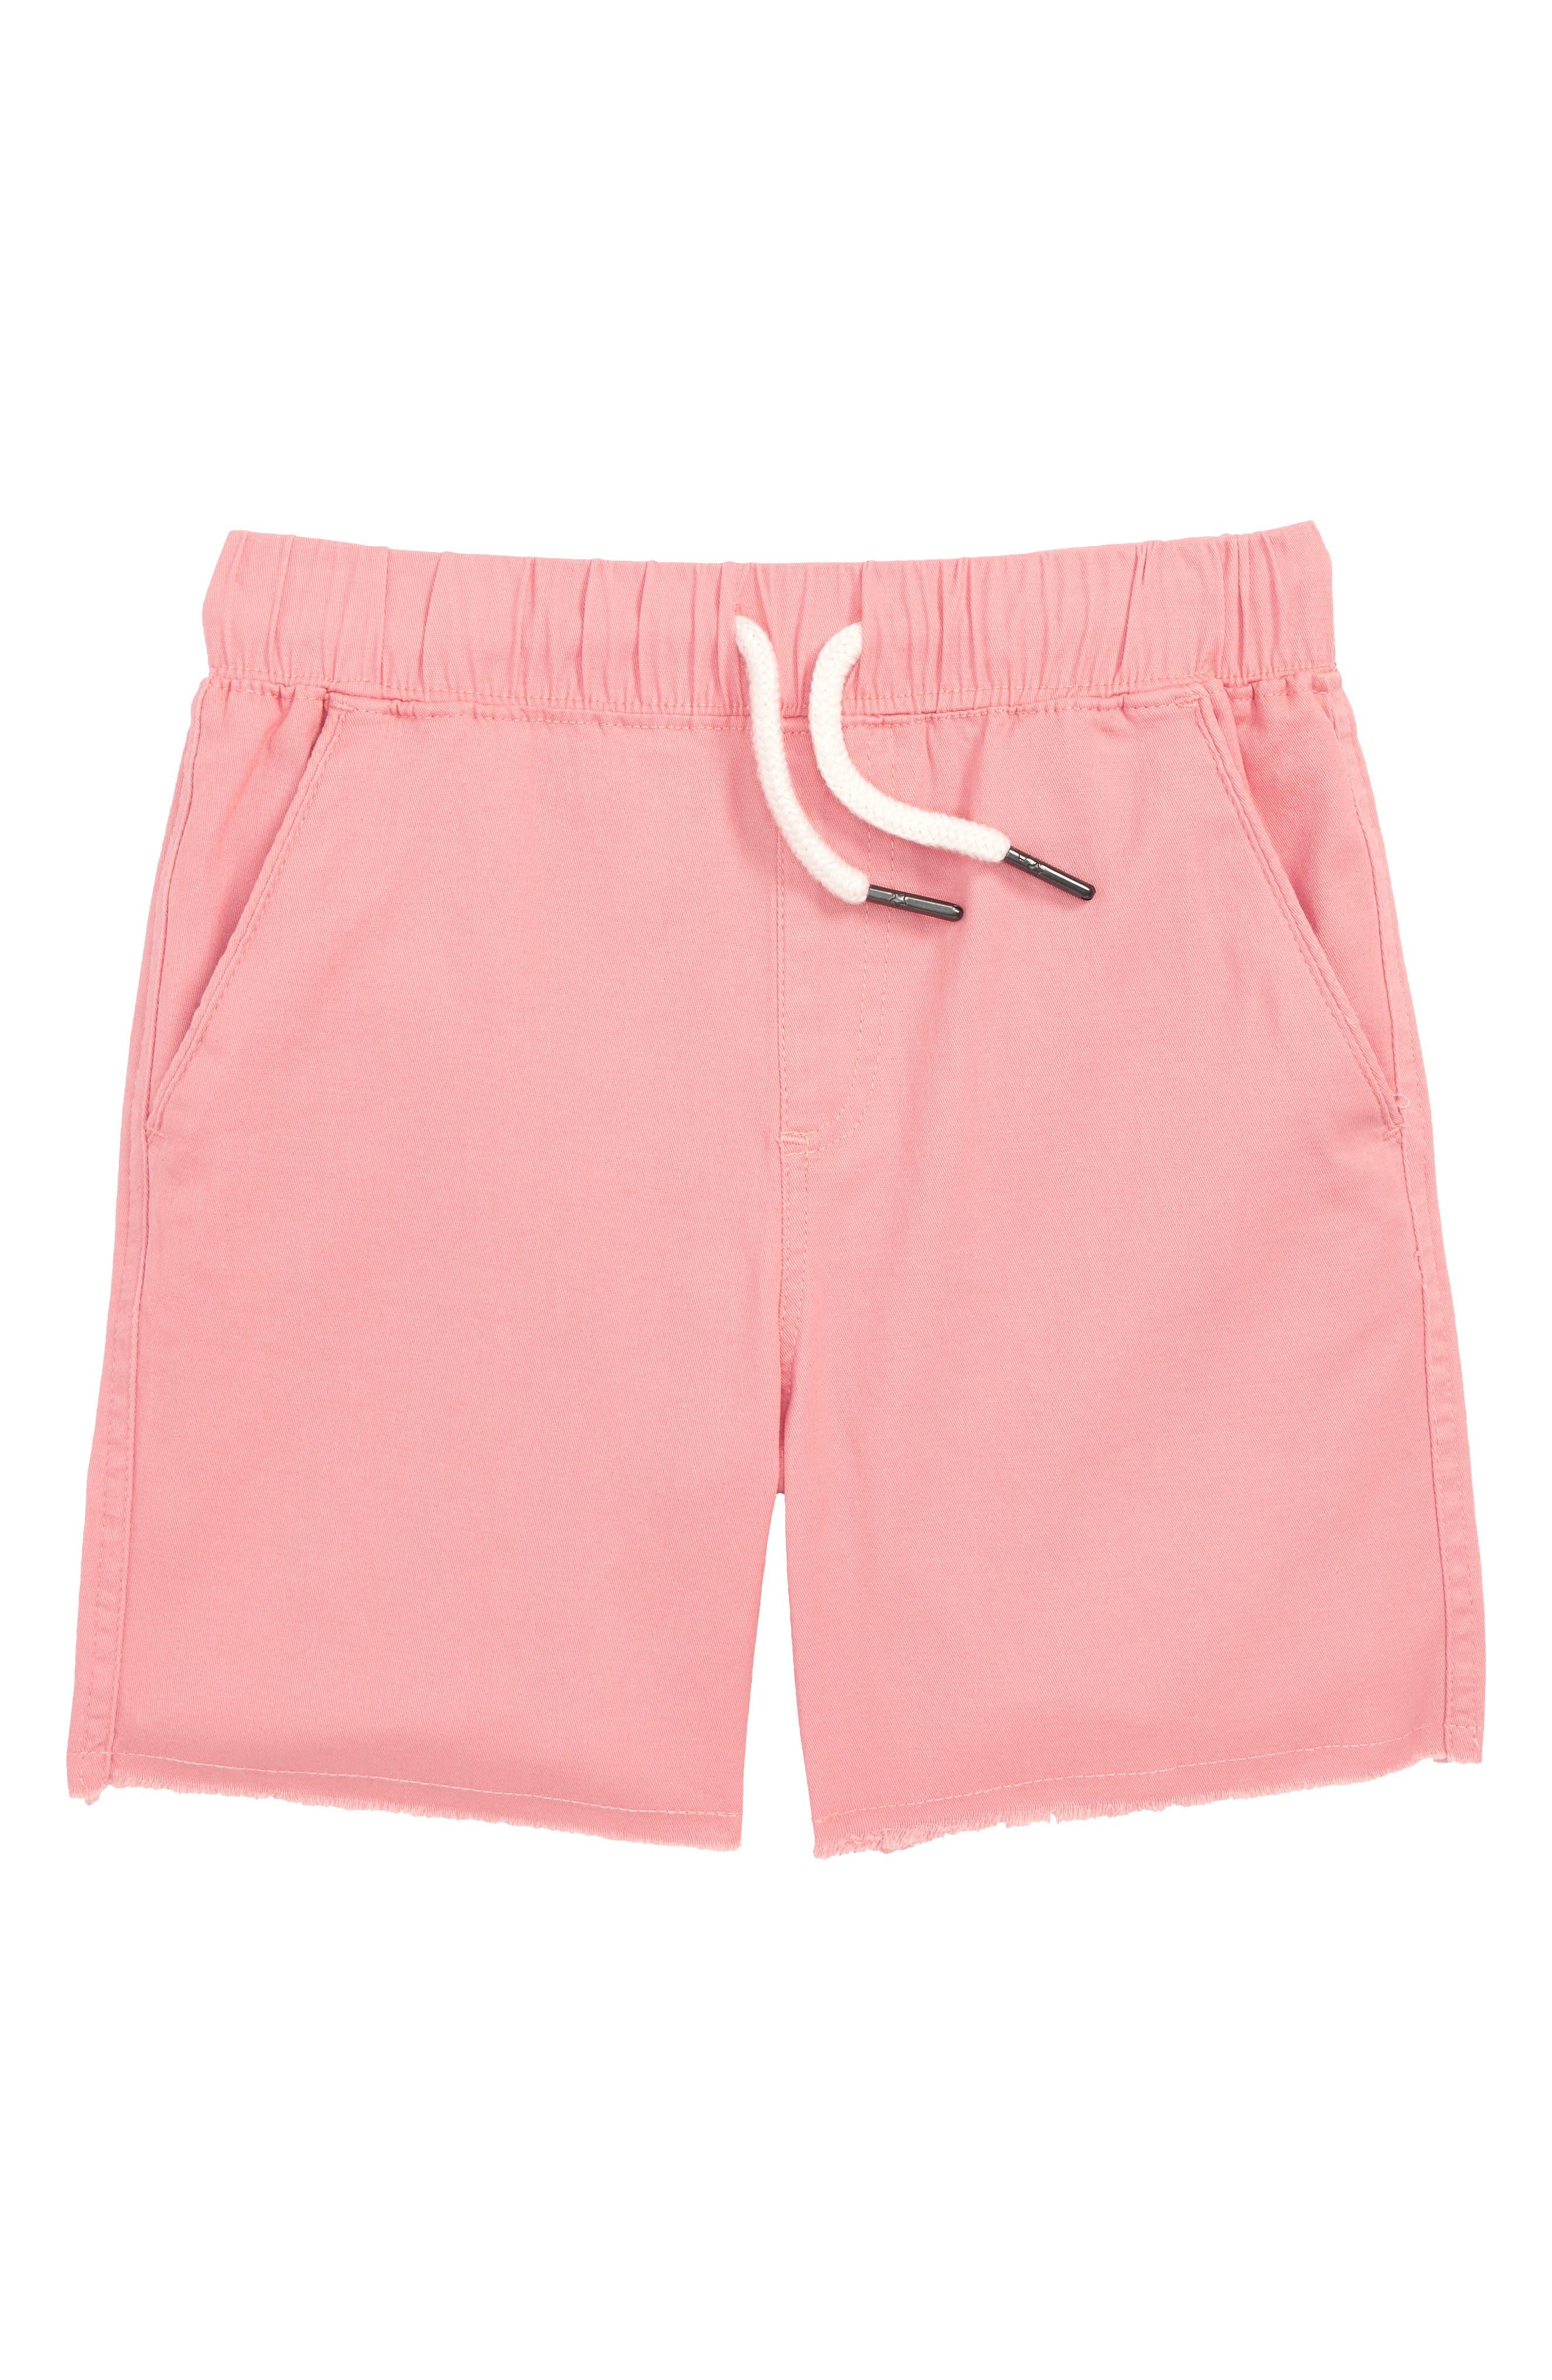 Alaska Shorts,                             Main thumbnail 1, color,                             Mauve